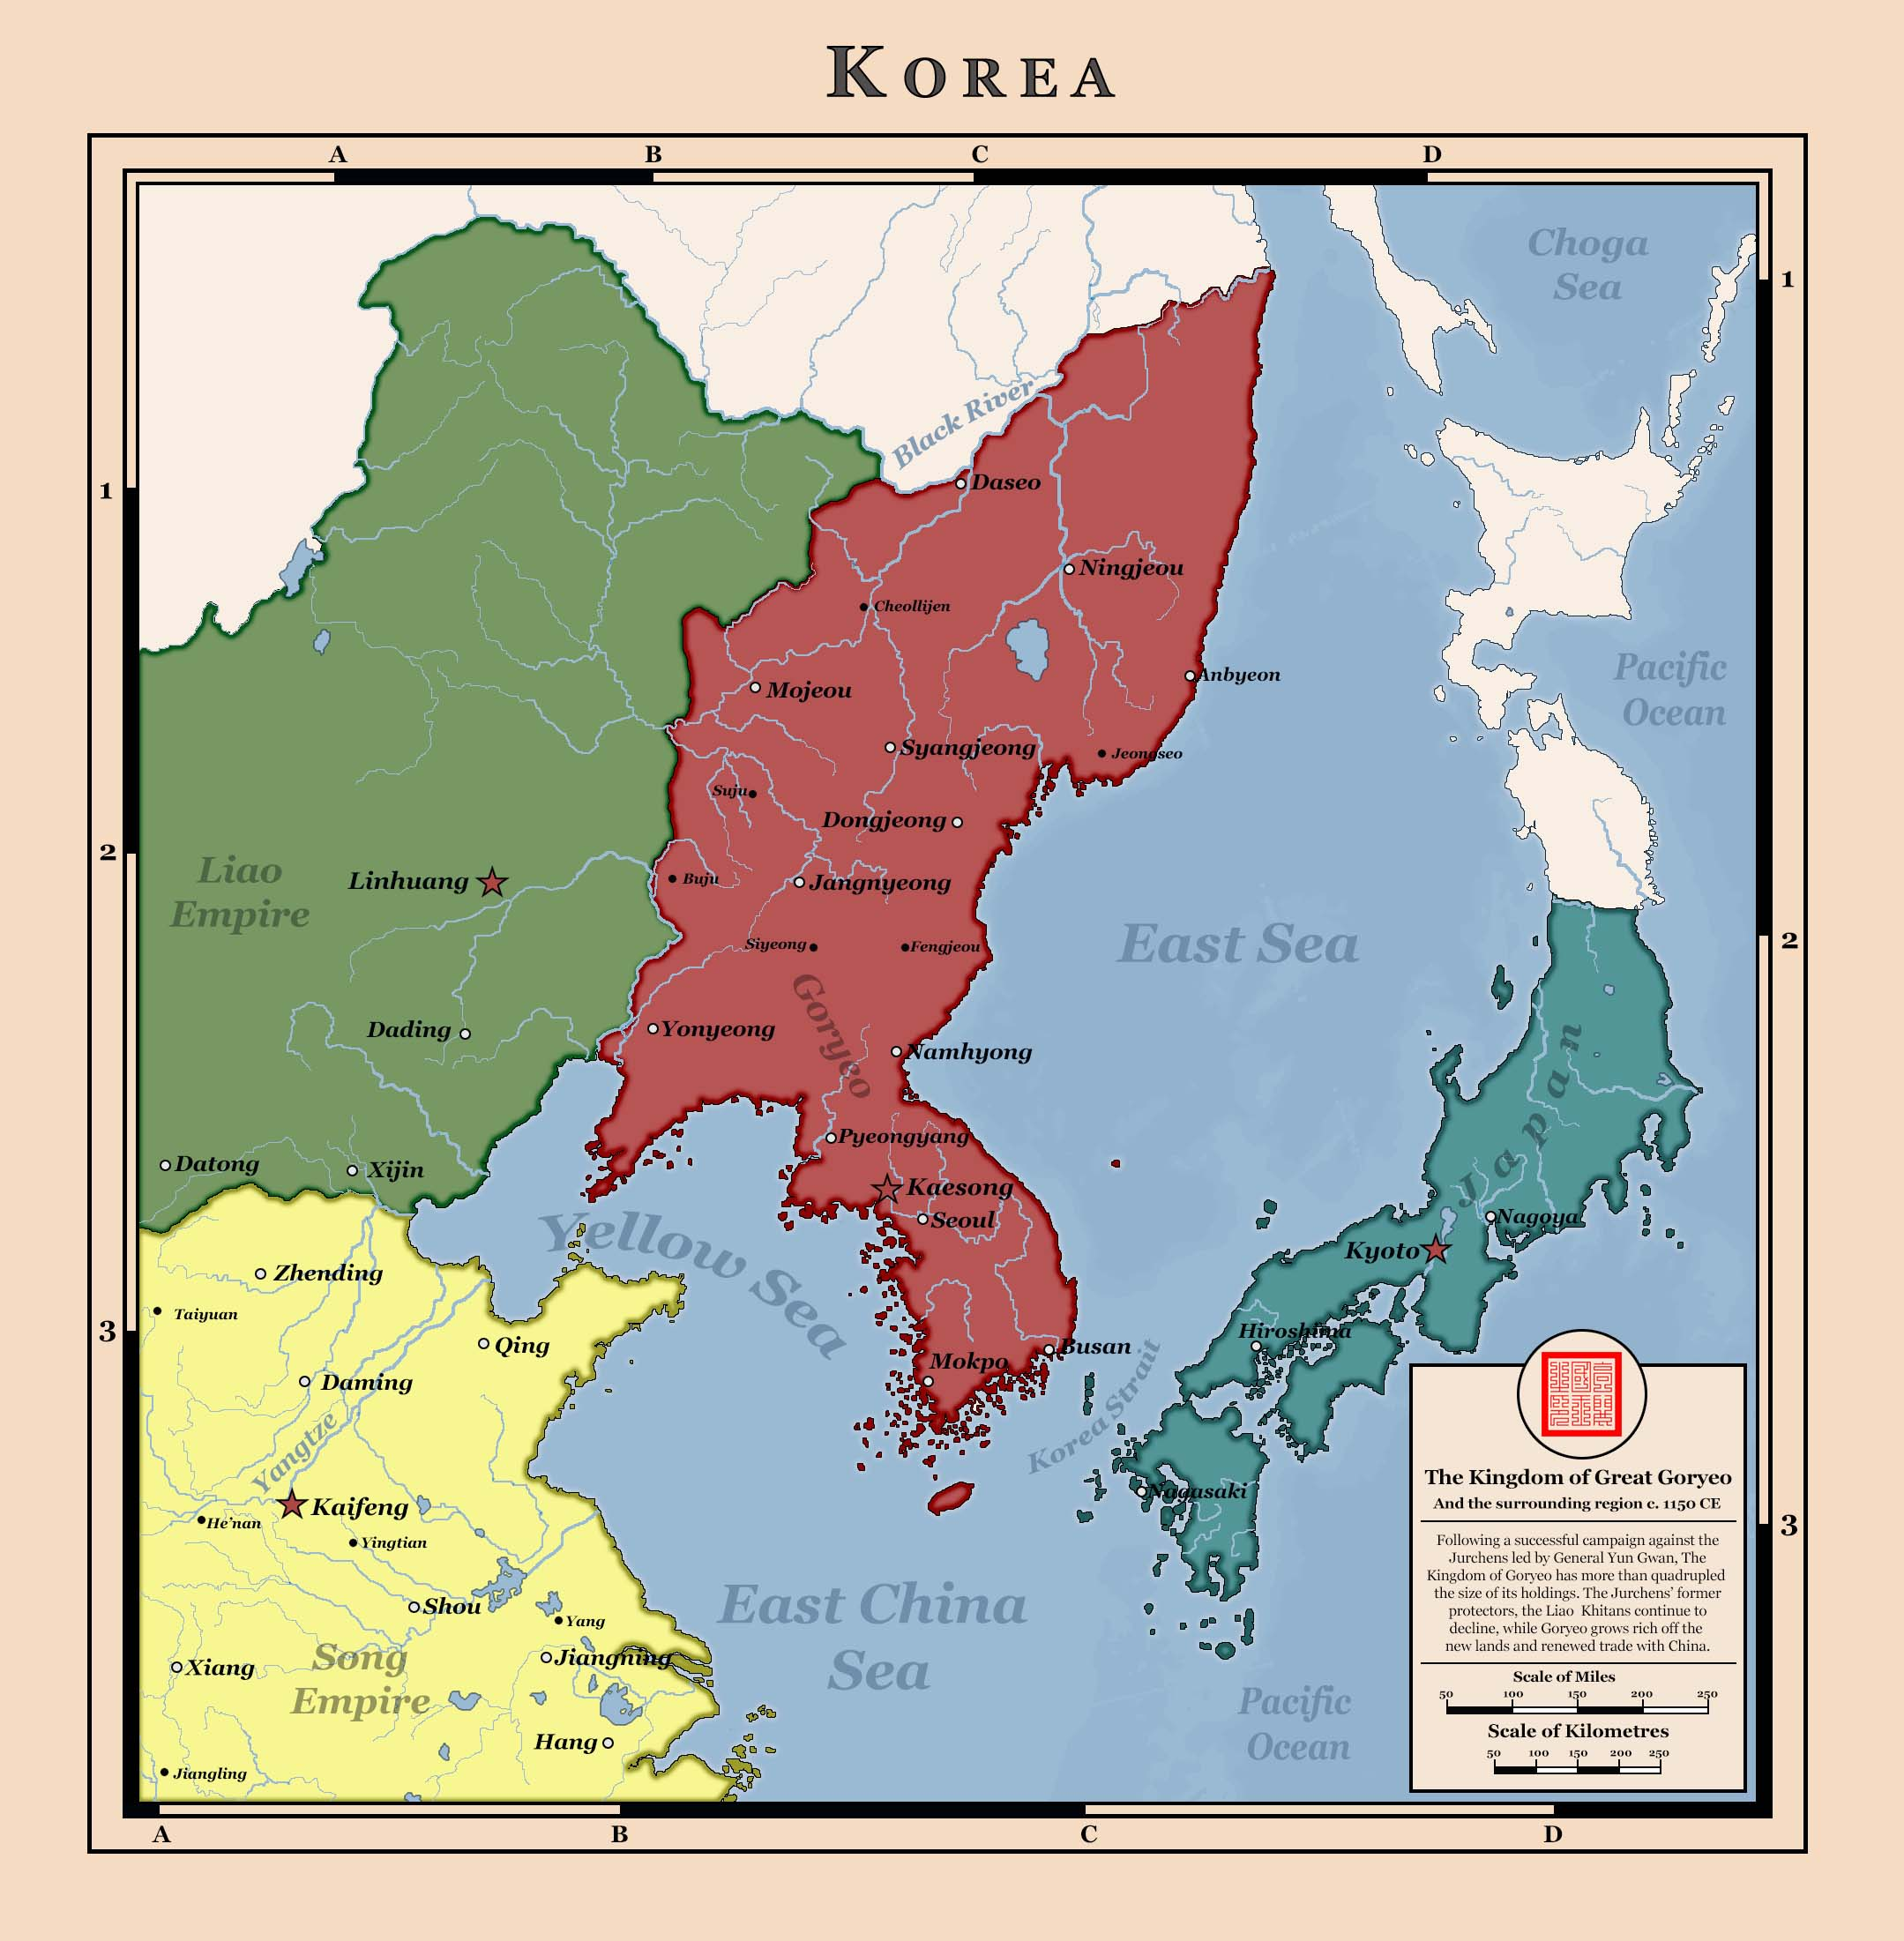 Korean Manchuria - main - zoomed 2.jpg